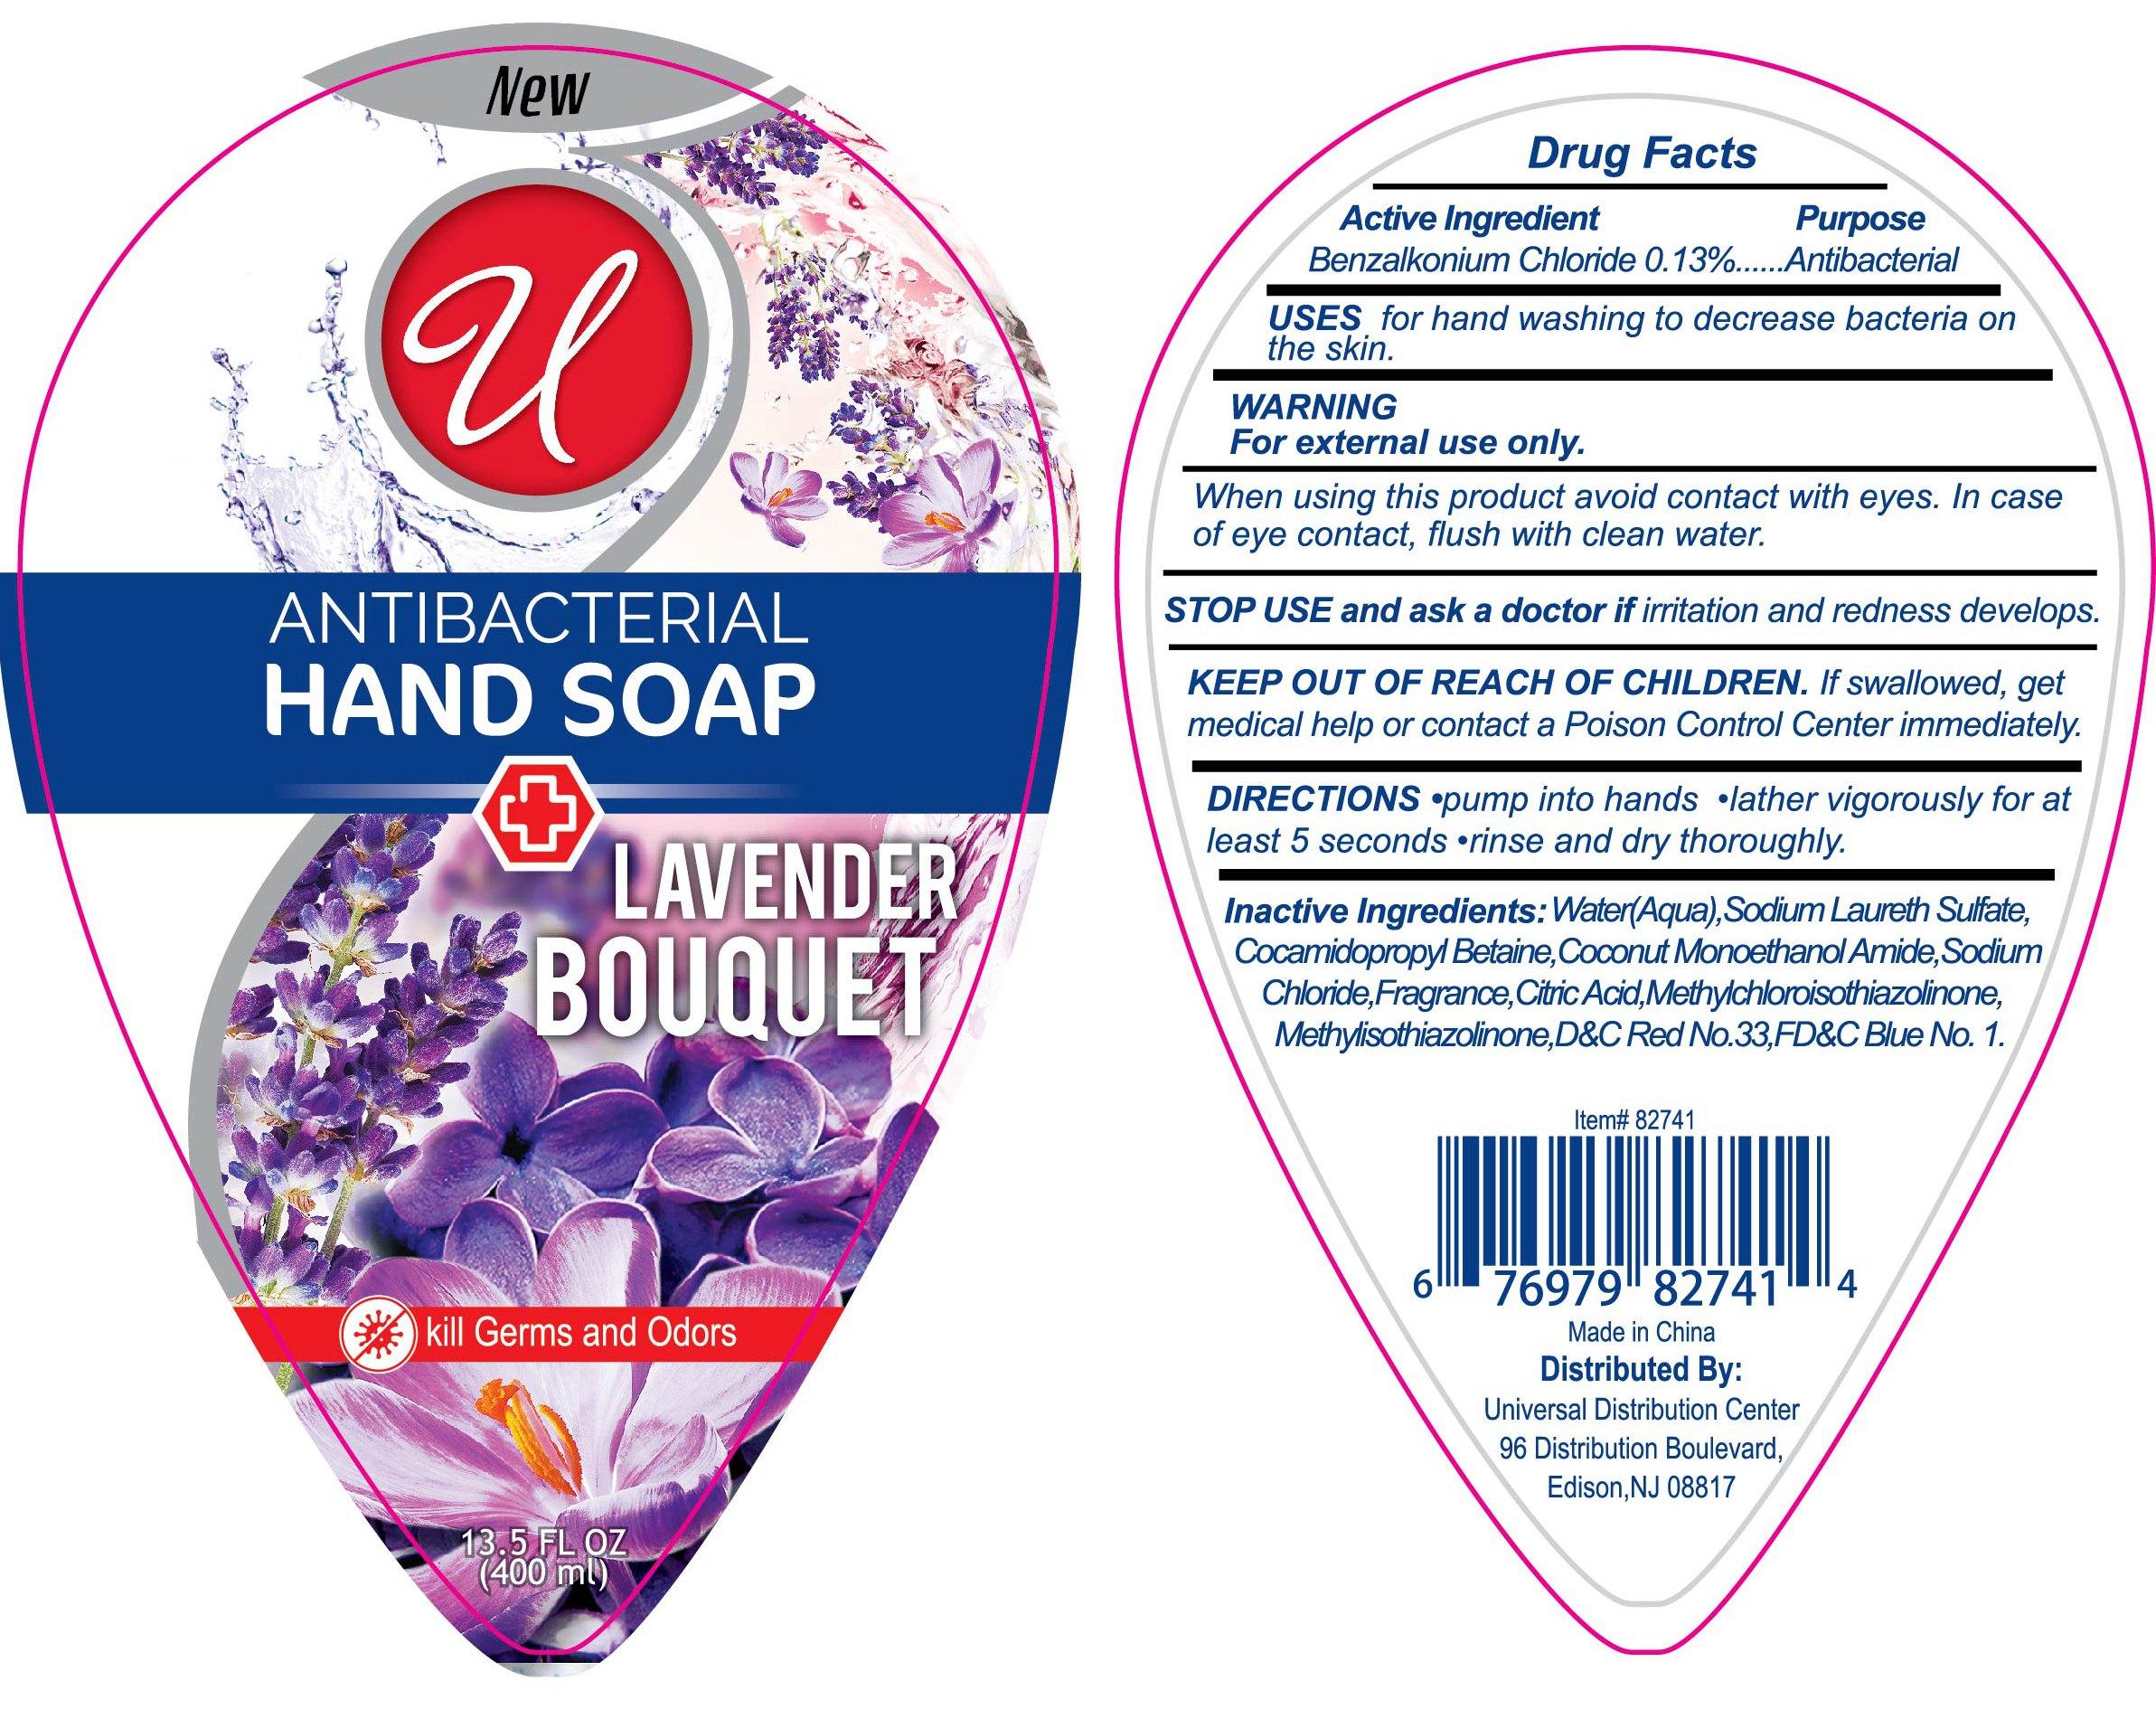 Antibacterial Handwash Lavender Bouquet | Benzalkonium Chloride 0.13 G In 100 Ml Breastfeeding